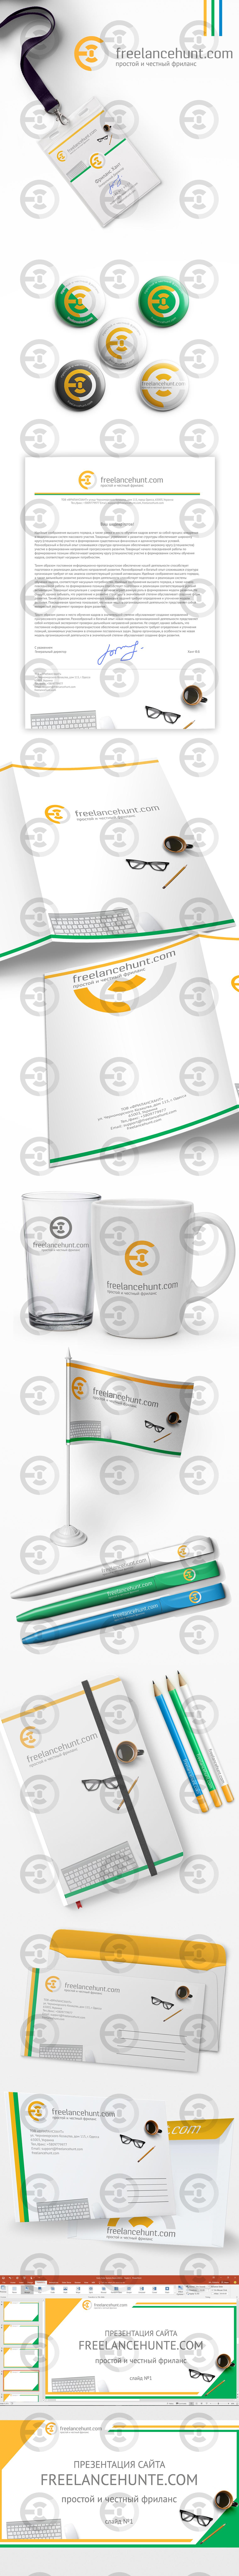 Freelancehint branding.jpg